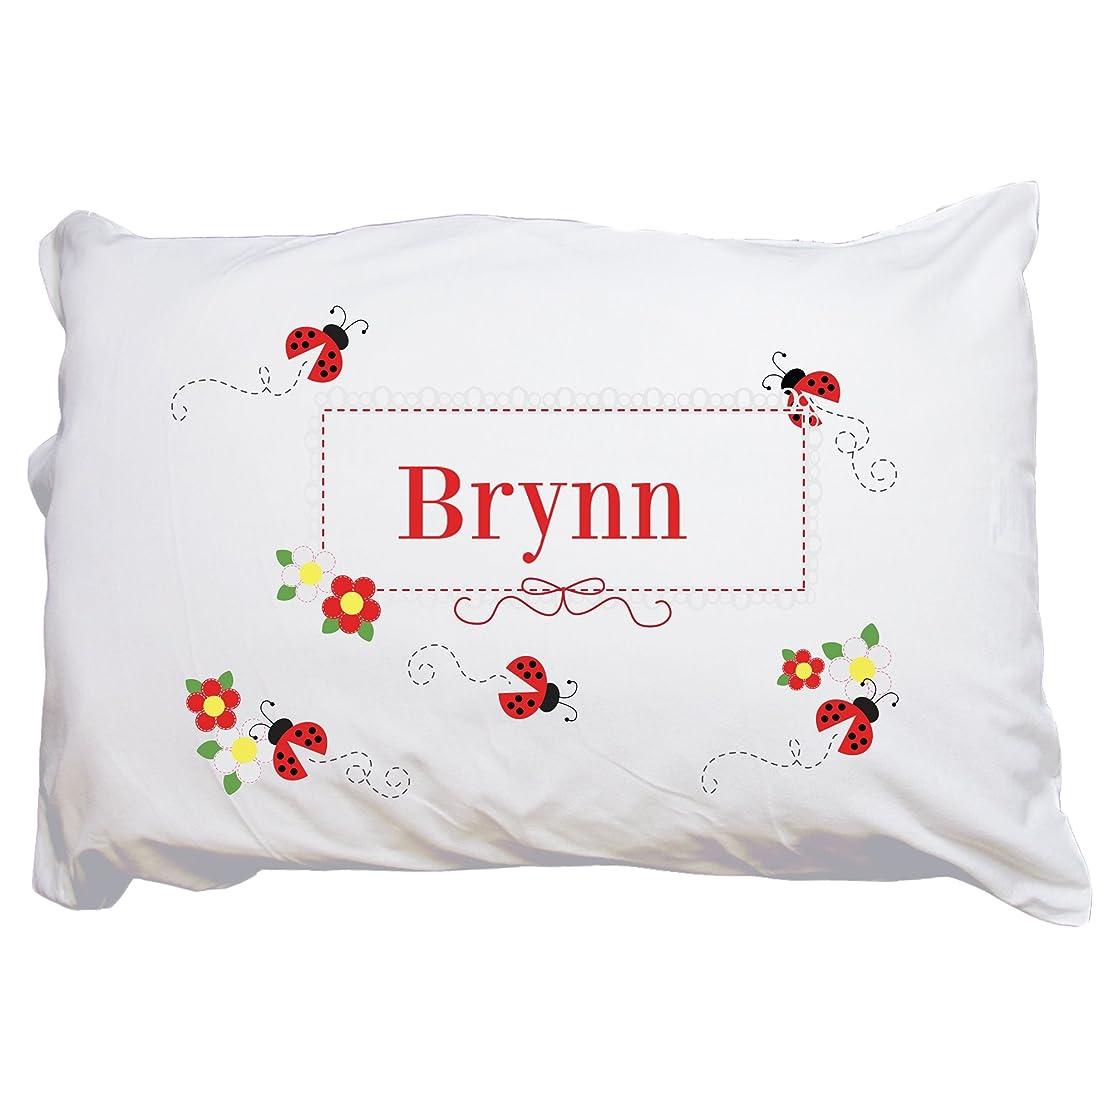 MyBambino Child's Personalized Ladybug Pillowcase Red